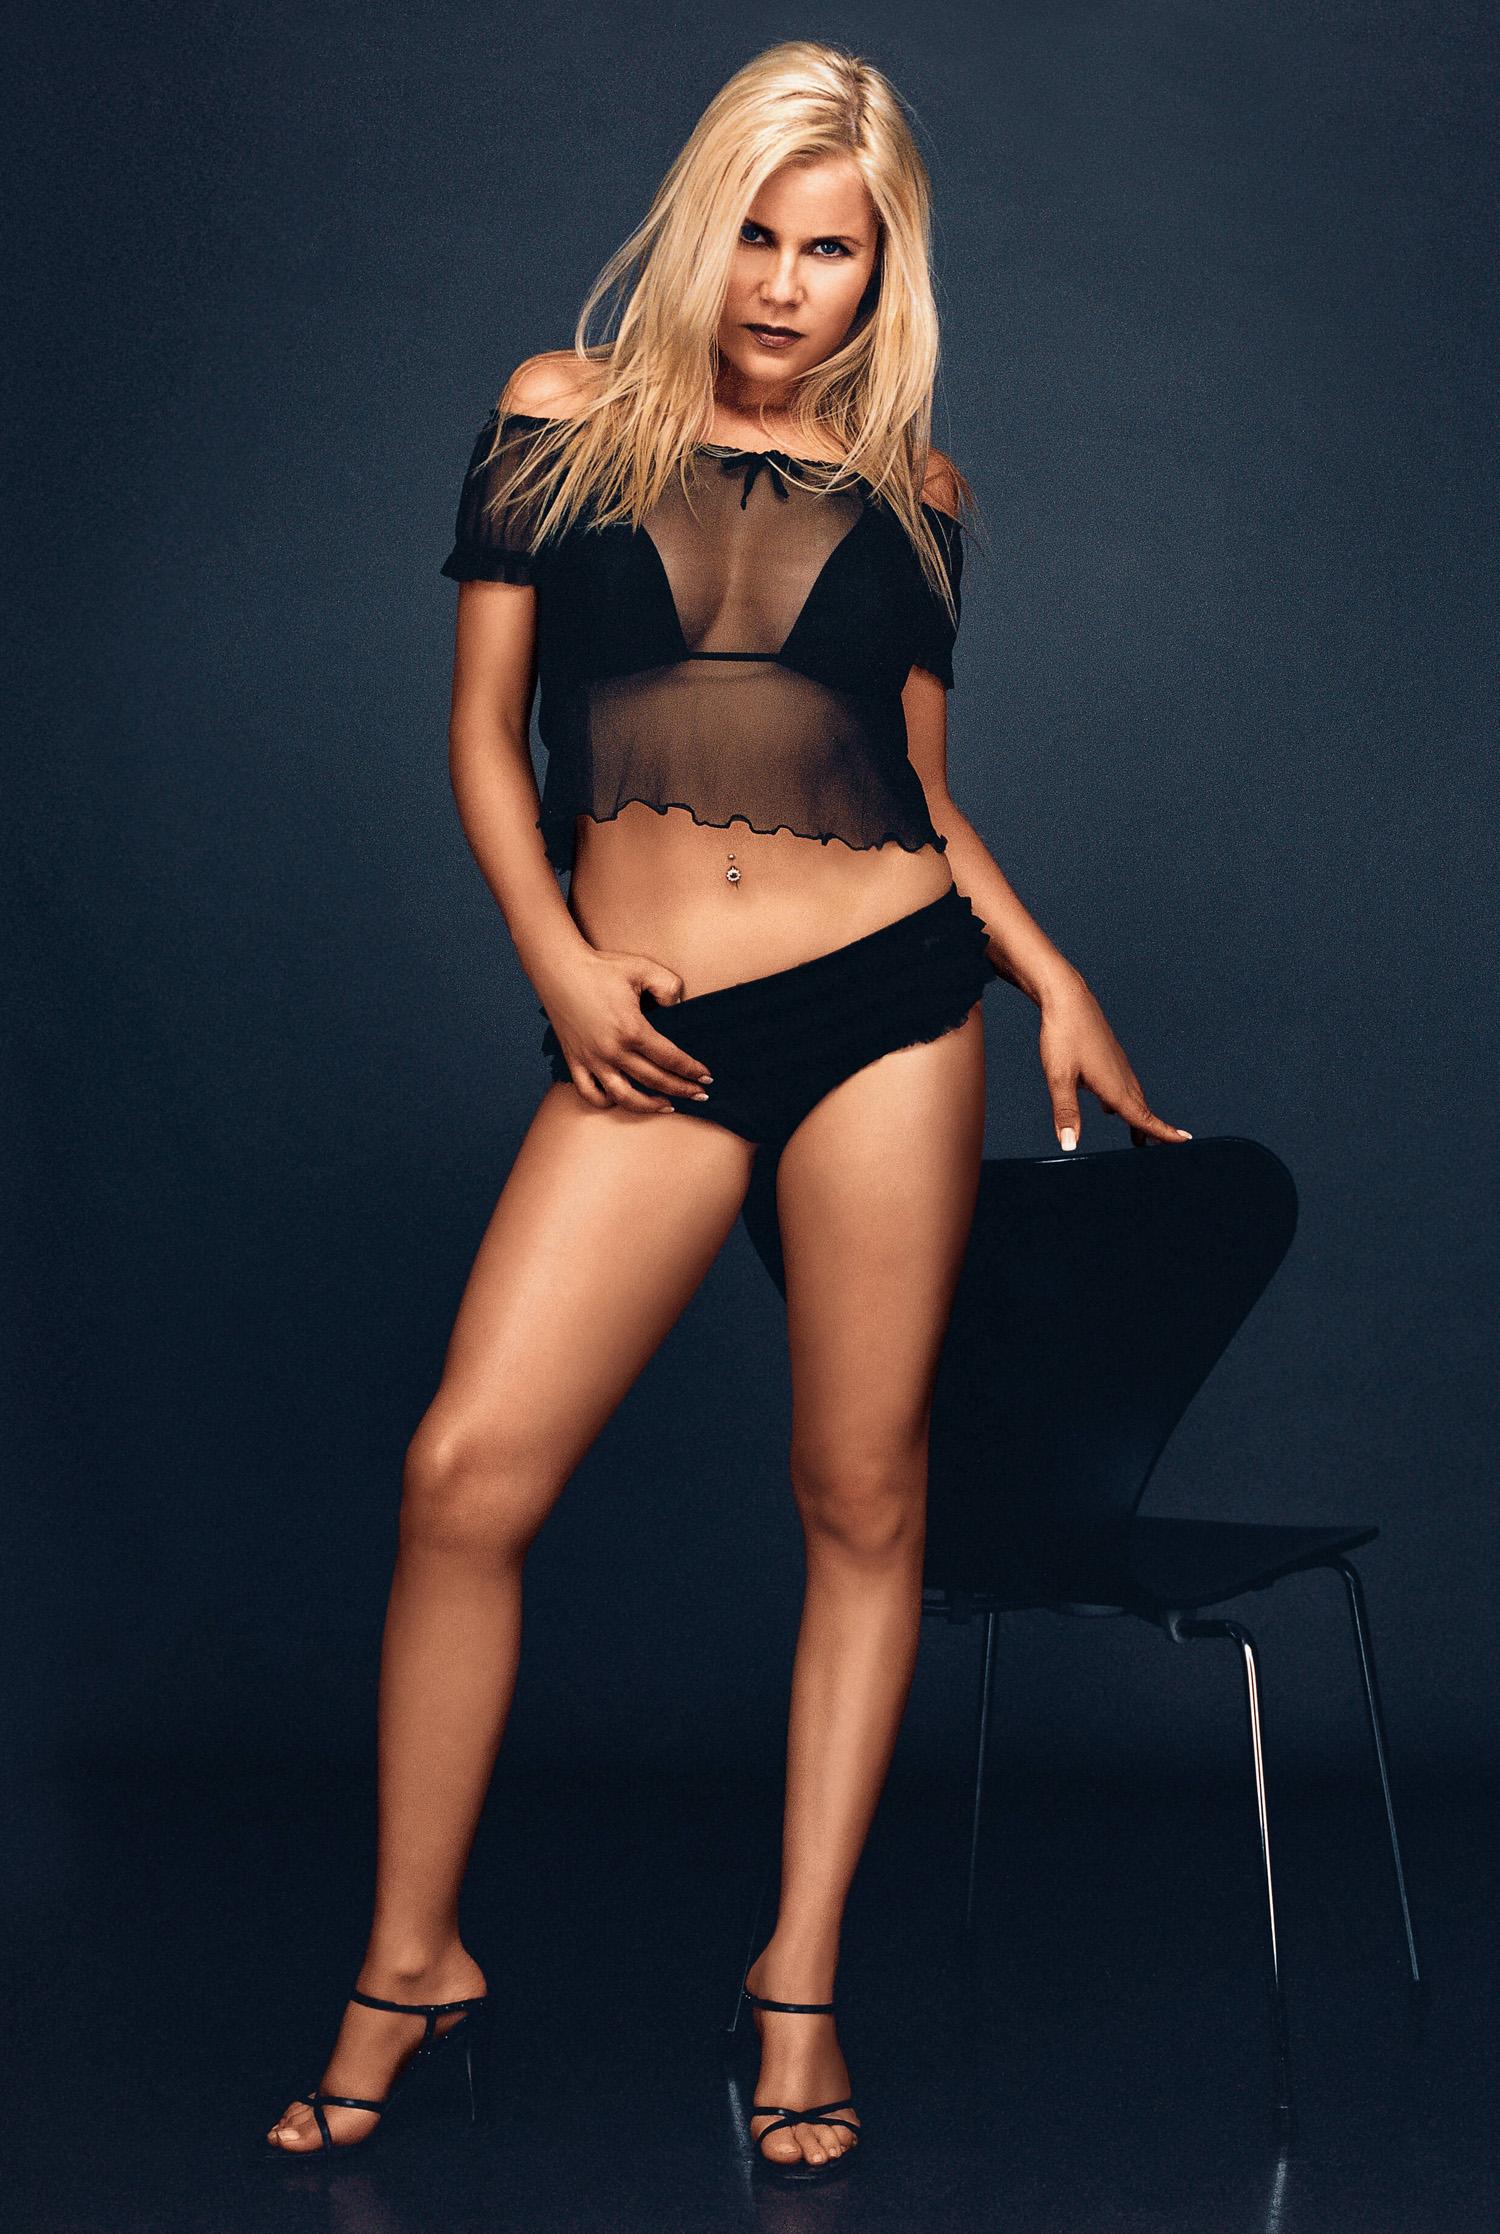 Михаэла Шаффрат (Gina Wild) голая. Фото - 90